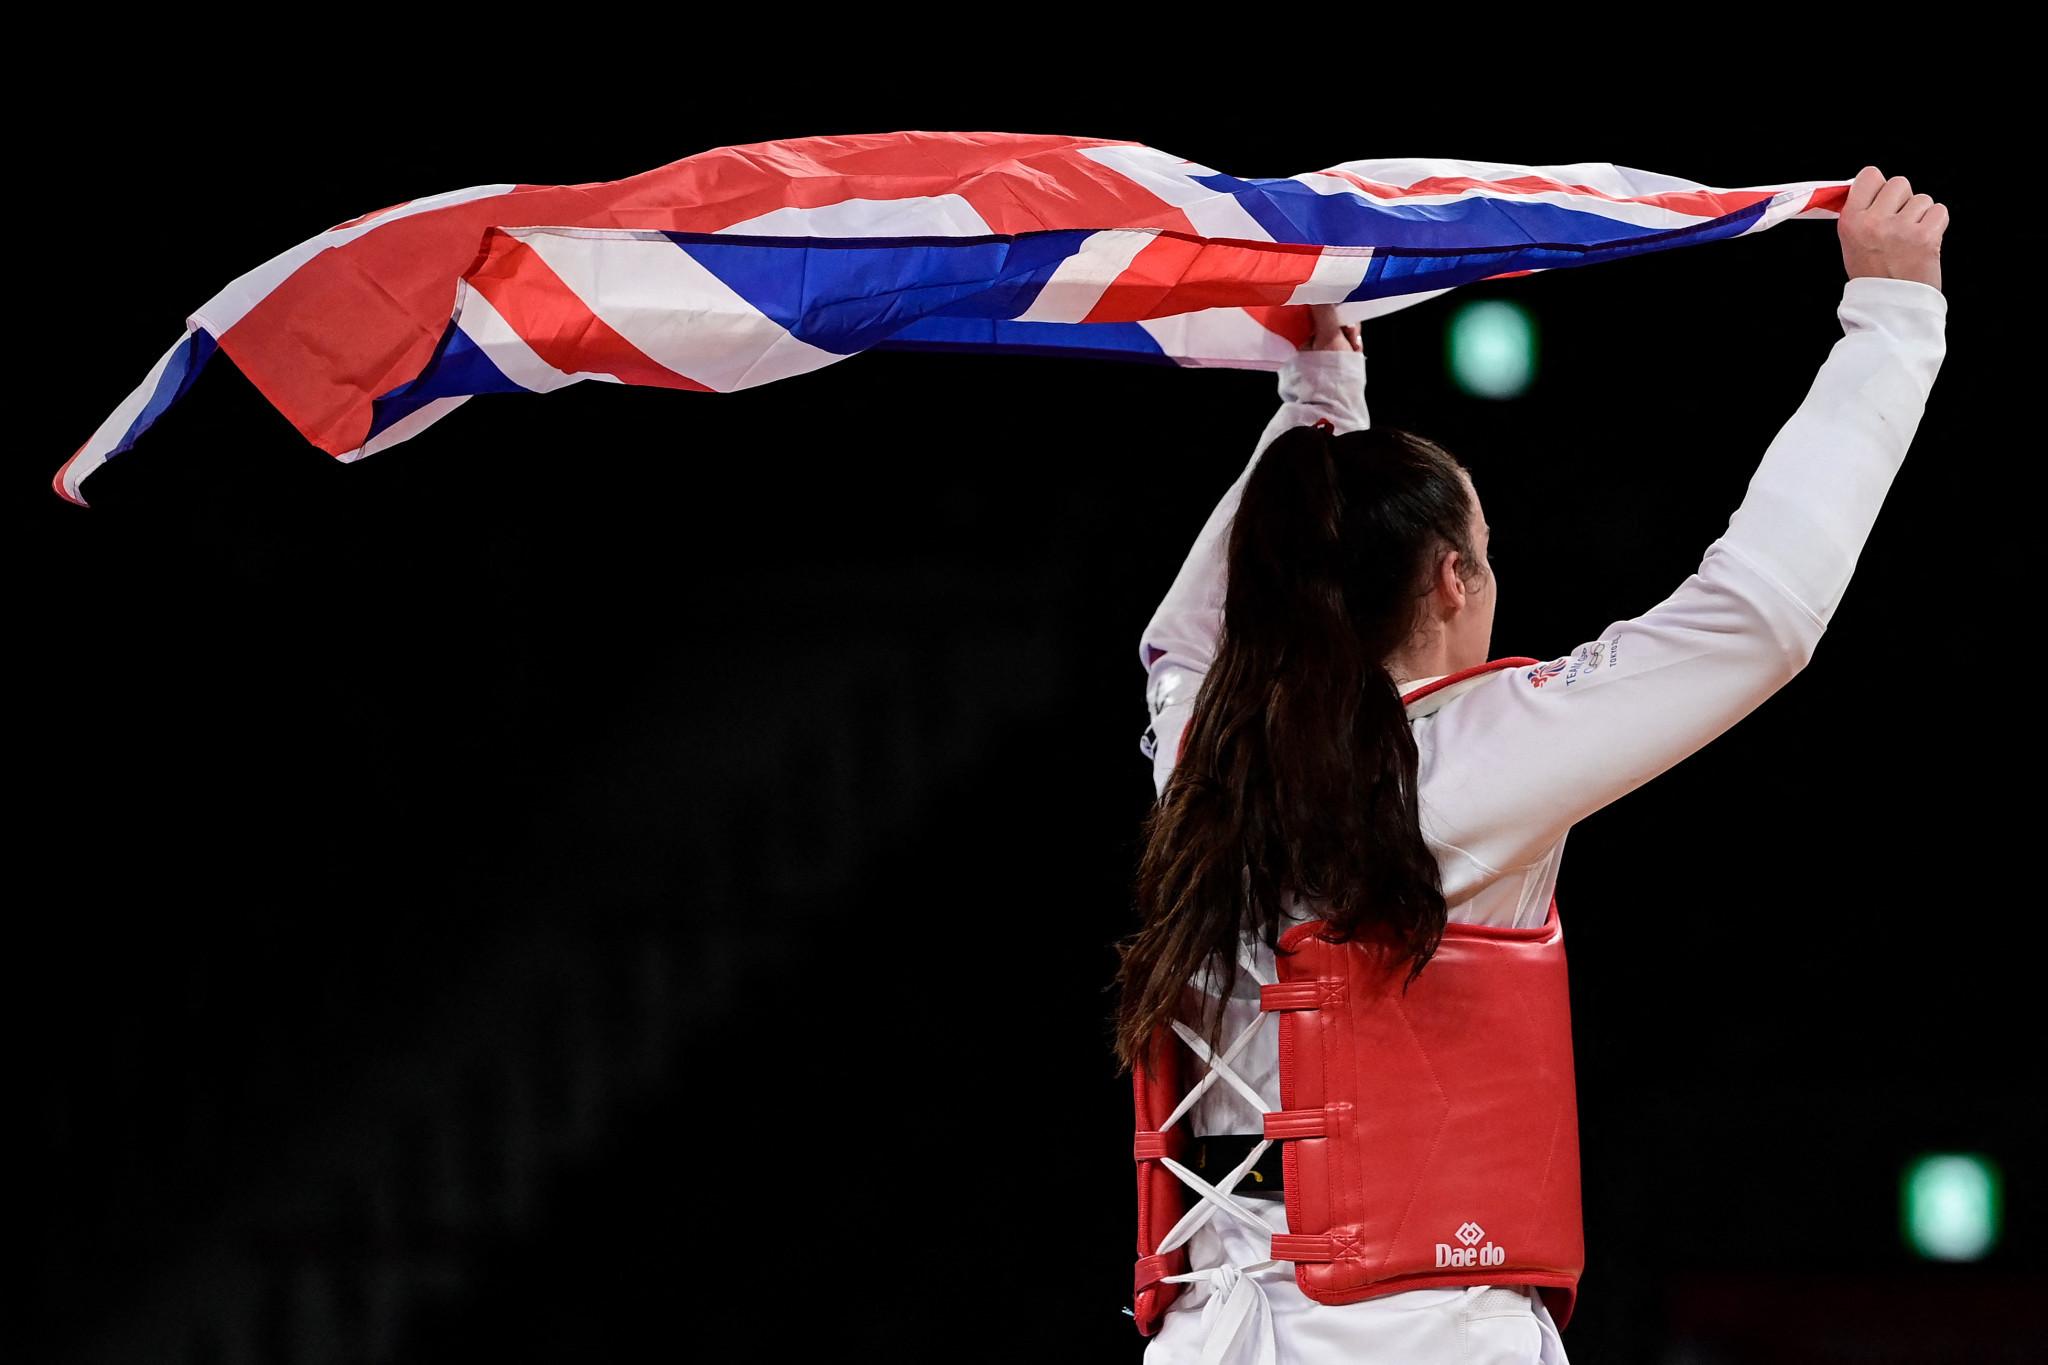 Manchester announced as host city of European Taekwondo Championships 2022